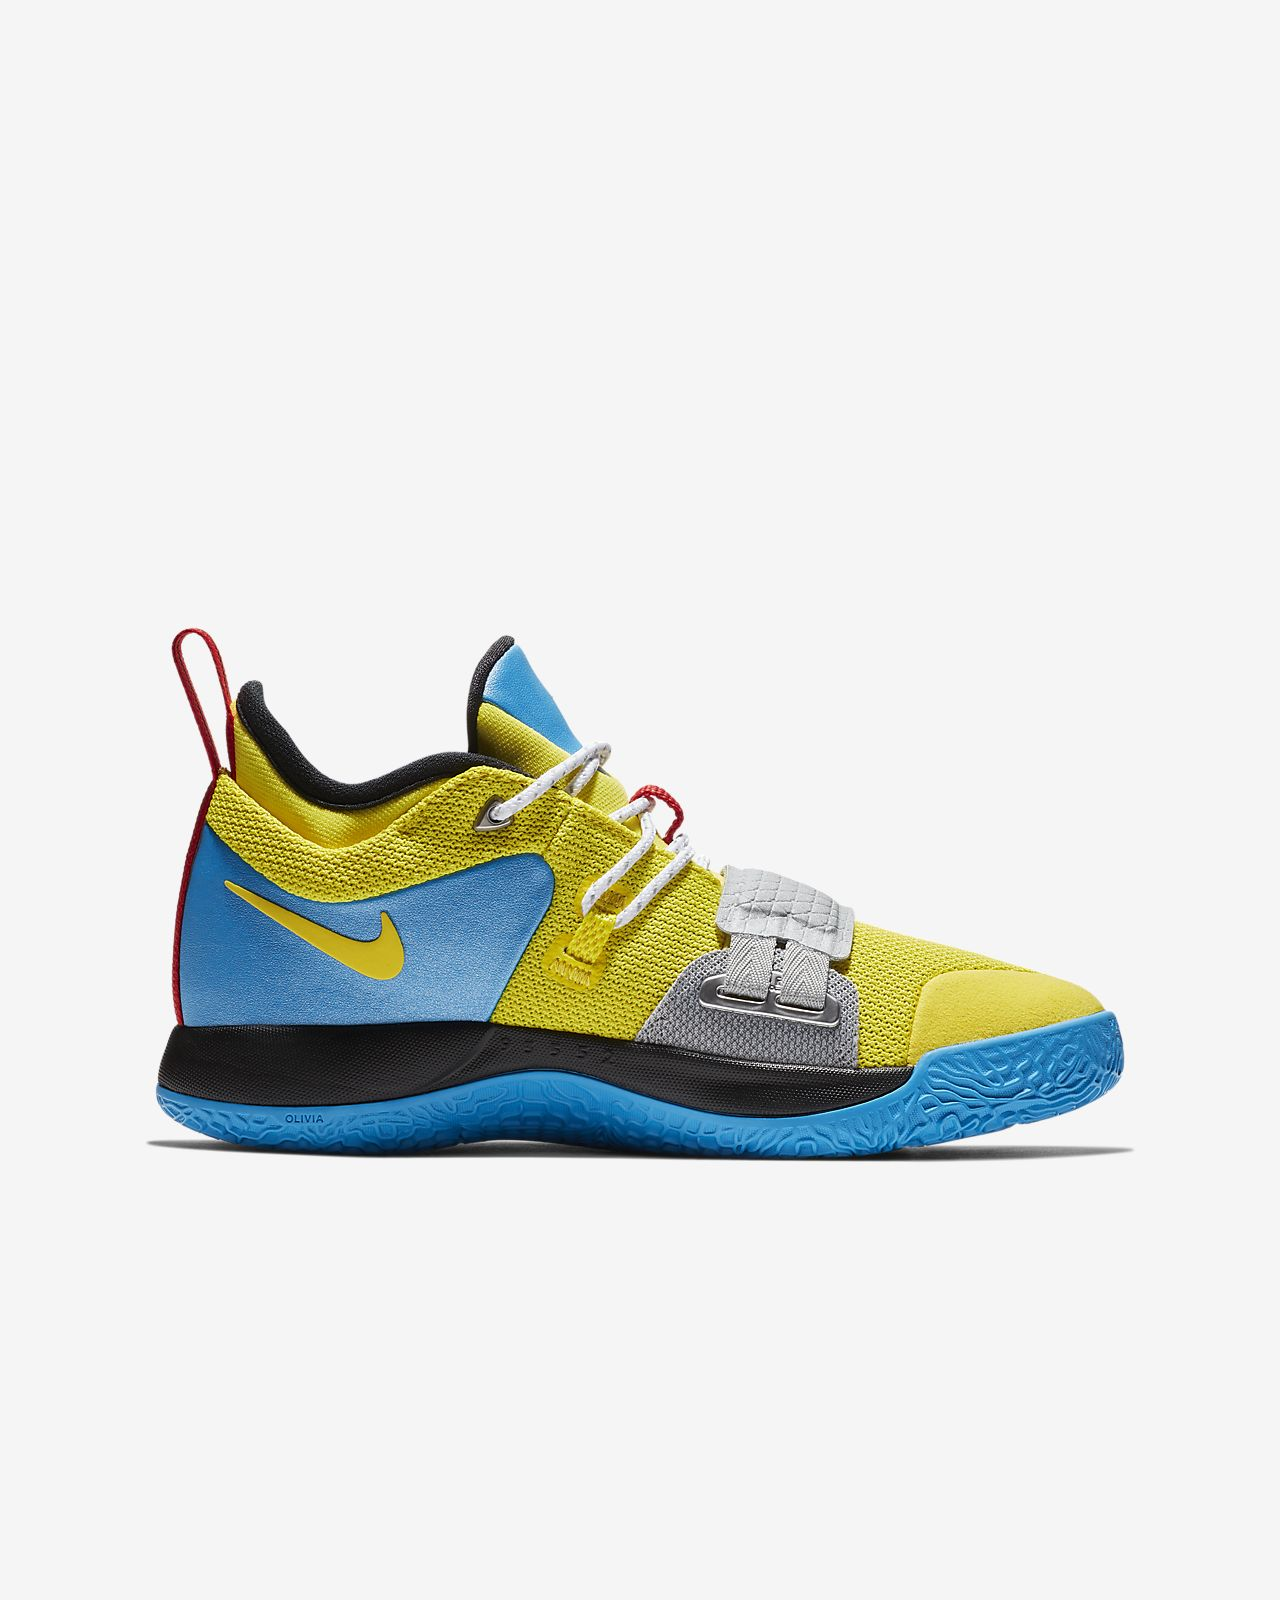 32c08f1cb71 PG 2.5 Big Kids  Basketball Shoe. Nike.com